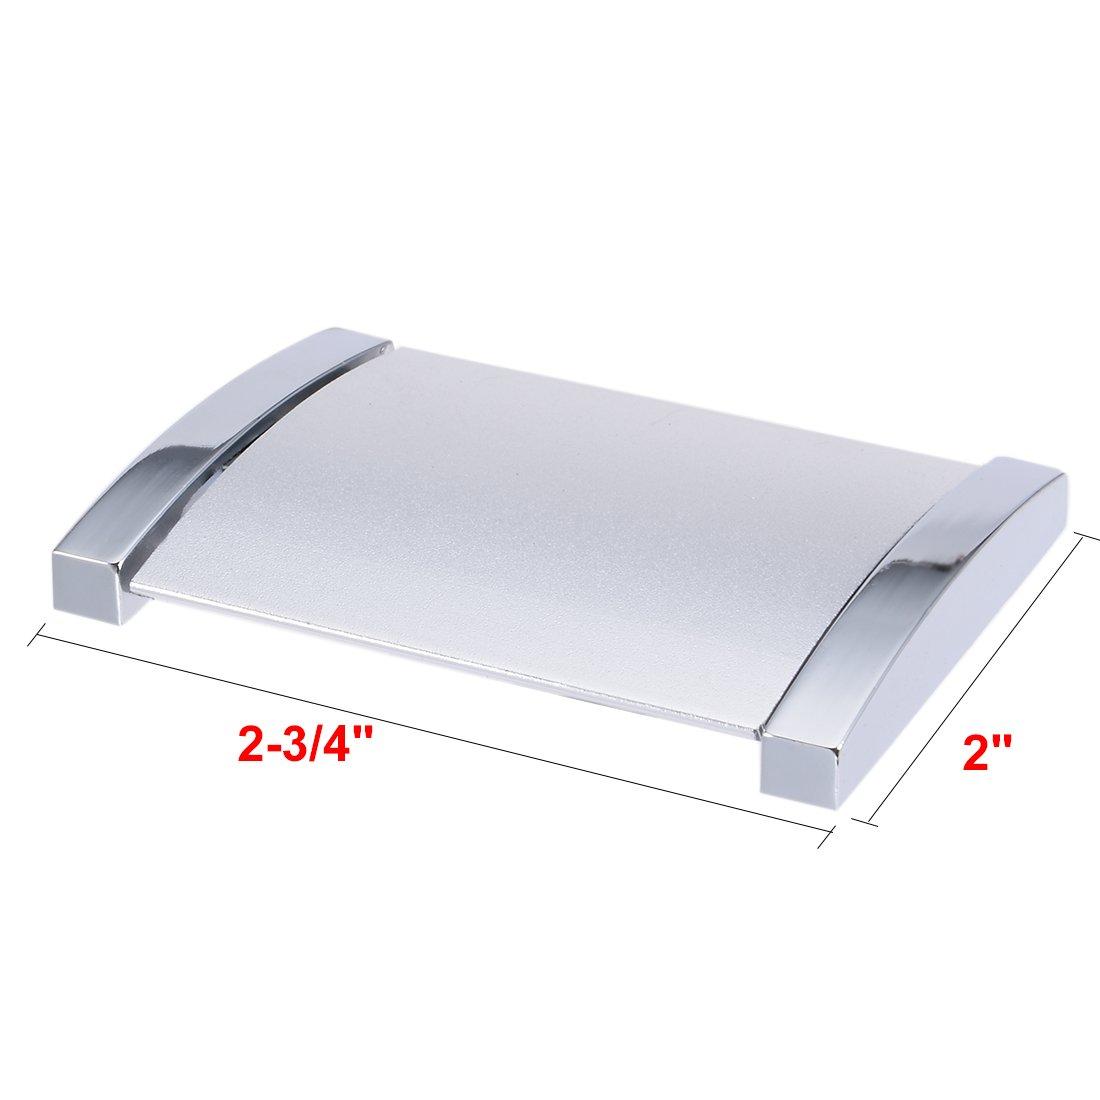 sourcingmap/® 2 Stk 4-Zoll x 2-Zoll Vertieft Schiebet/ür Griff Abdeckung Flach Ziehen Silver DE de